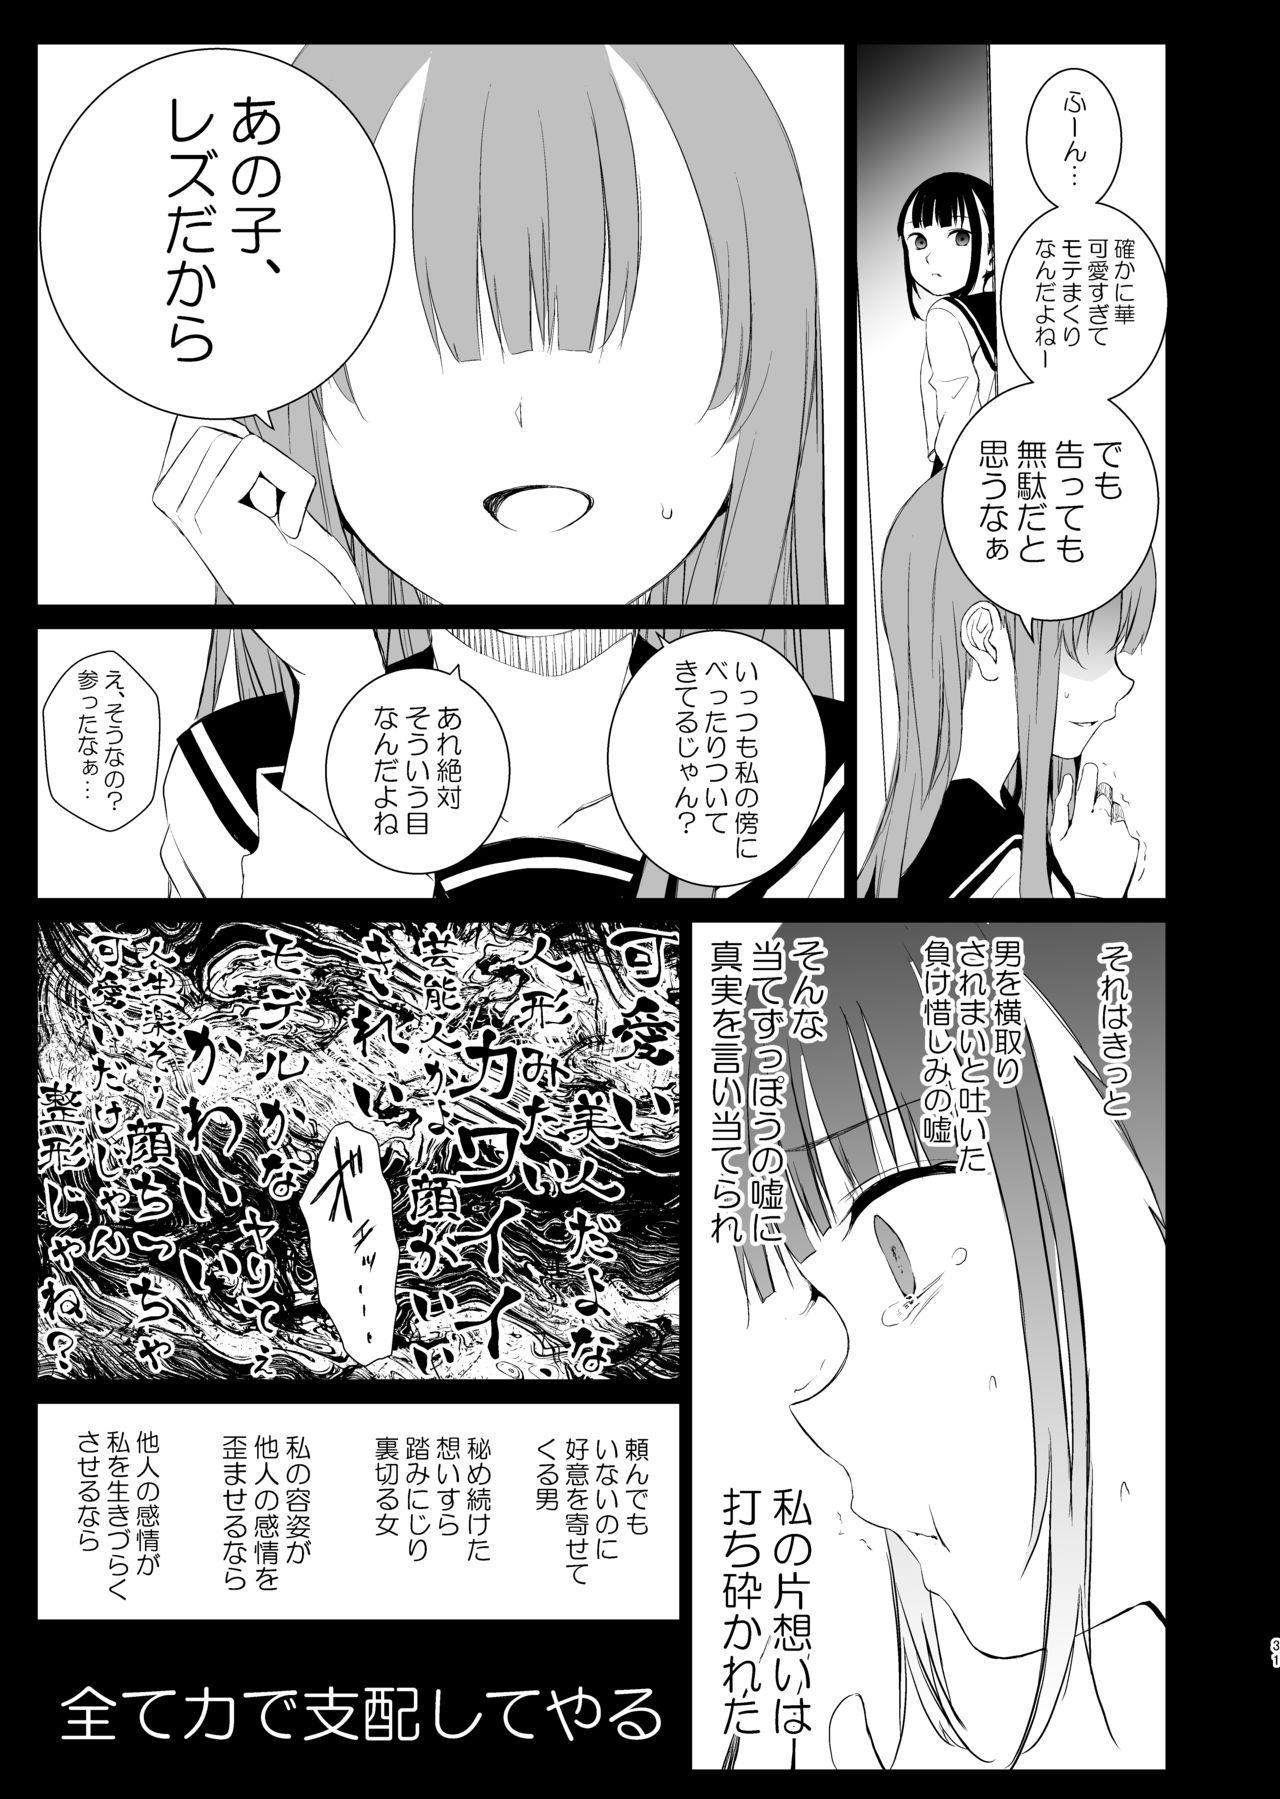 Hanayomi no Makurakotoba 29